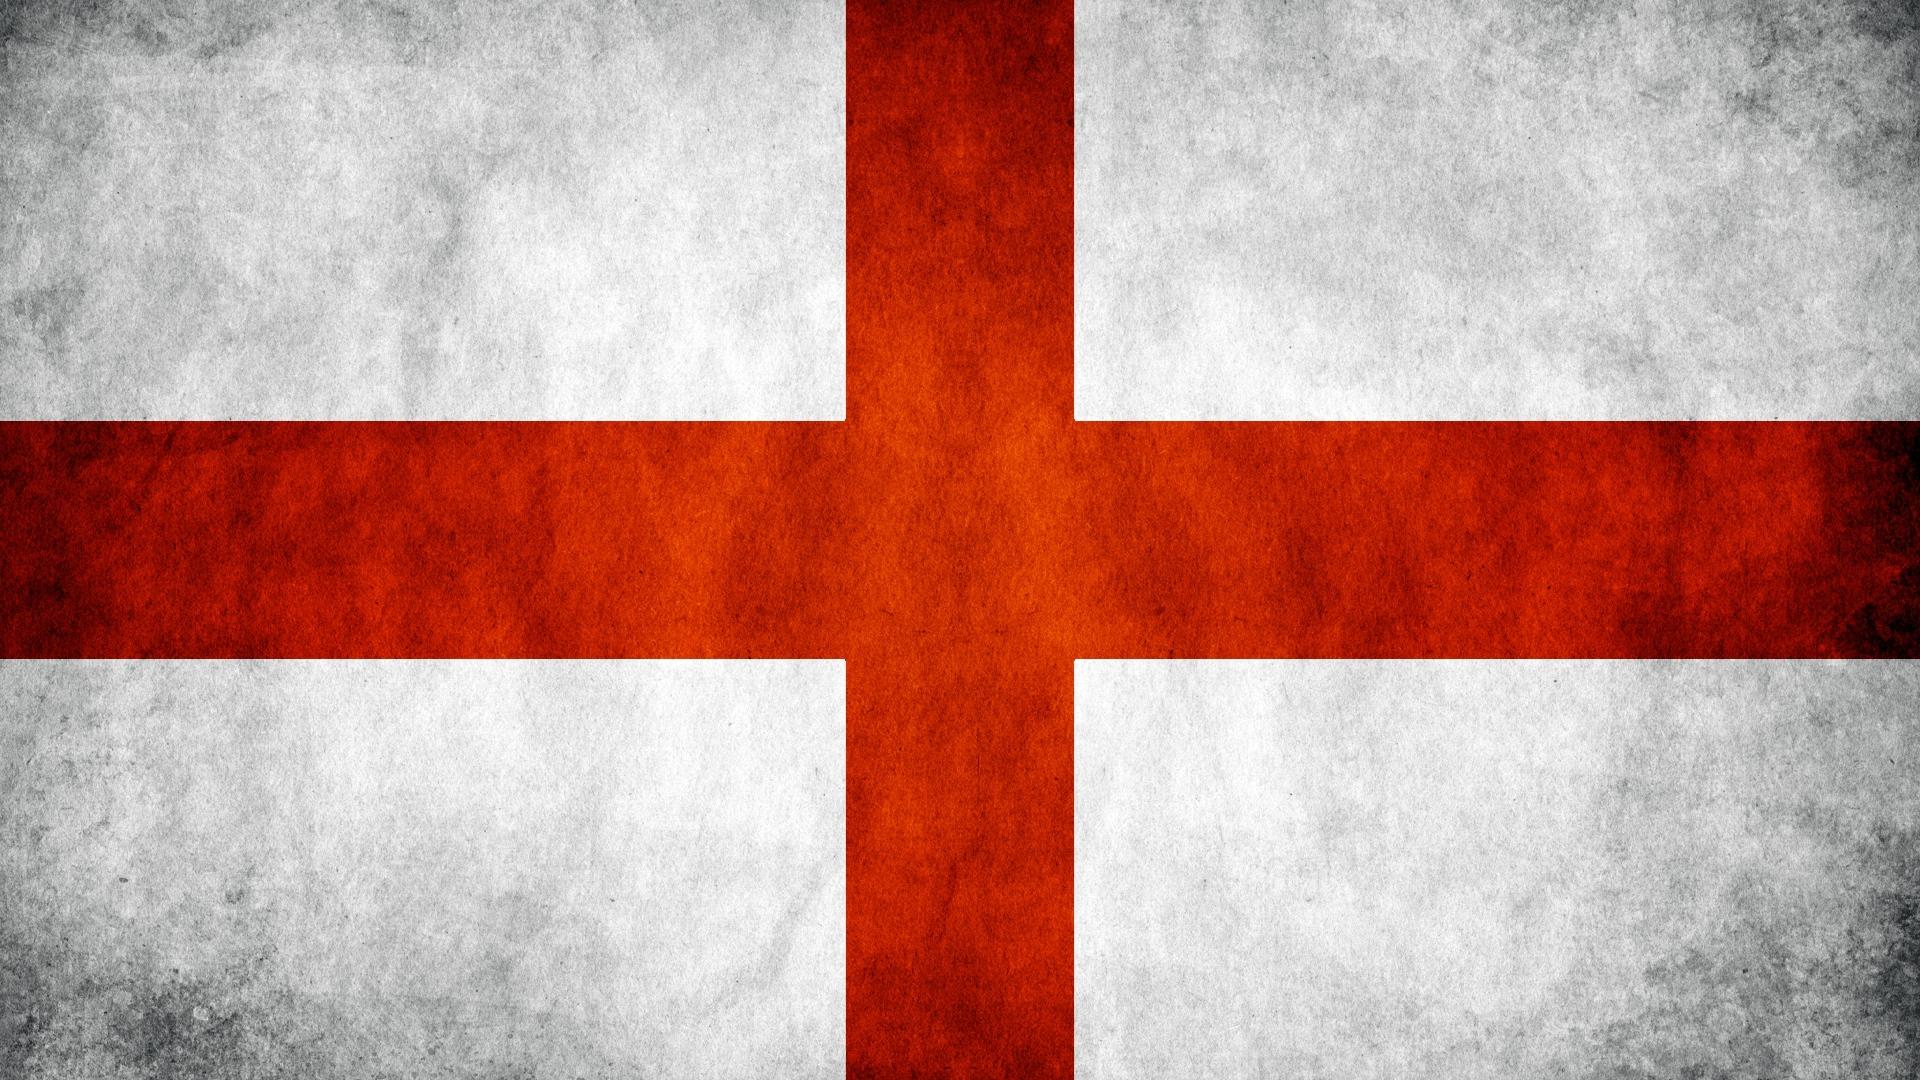 Download Wallpaper 1920x1080 England Flag Texture